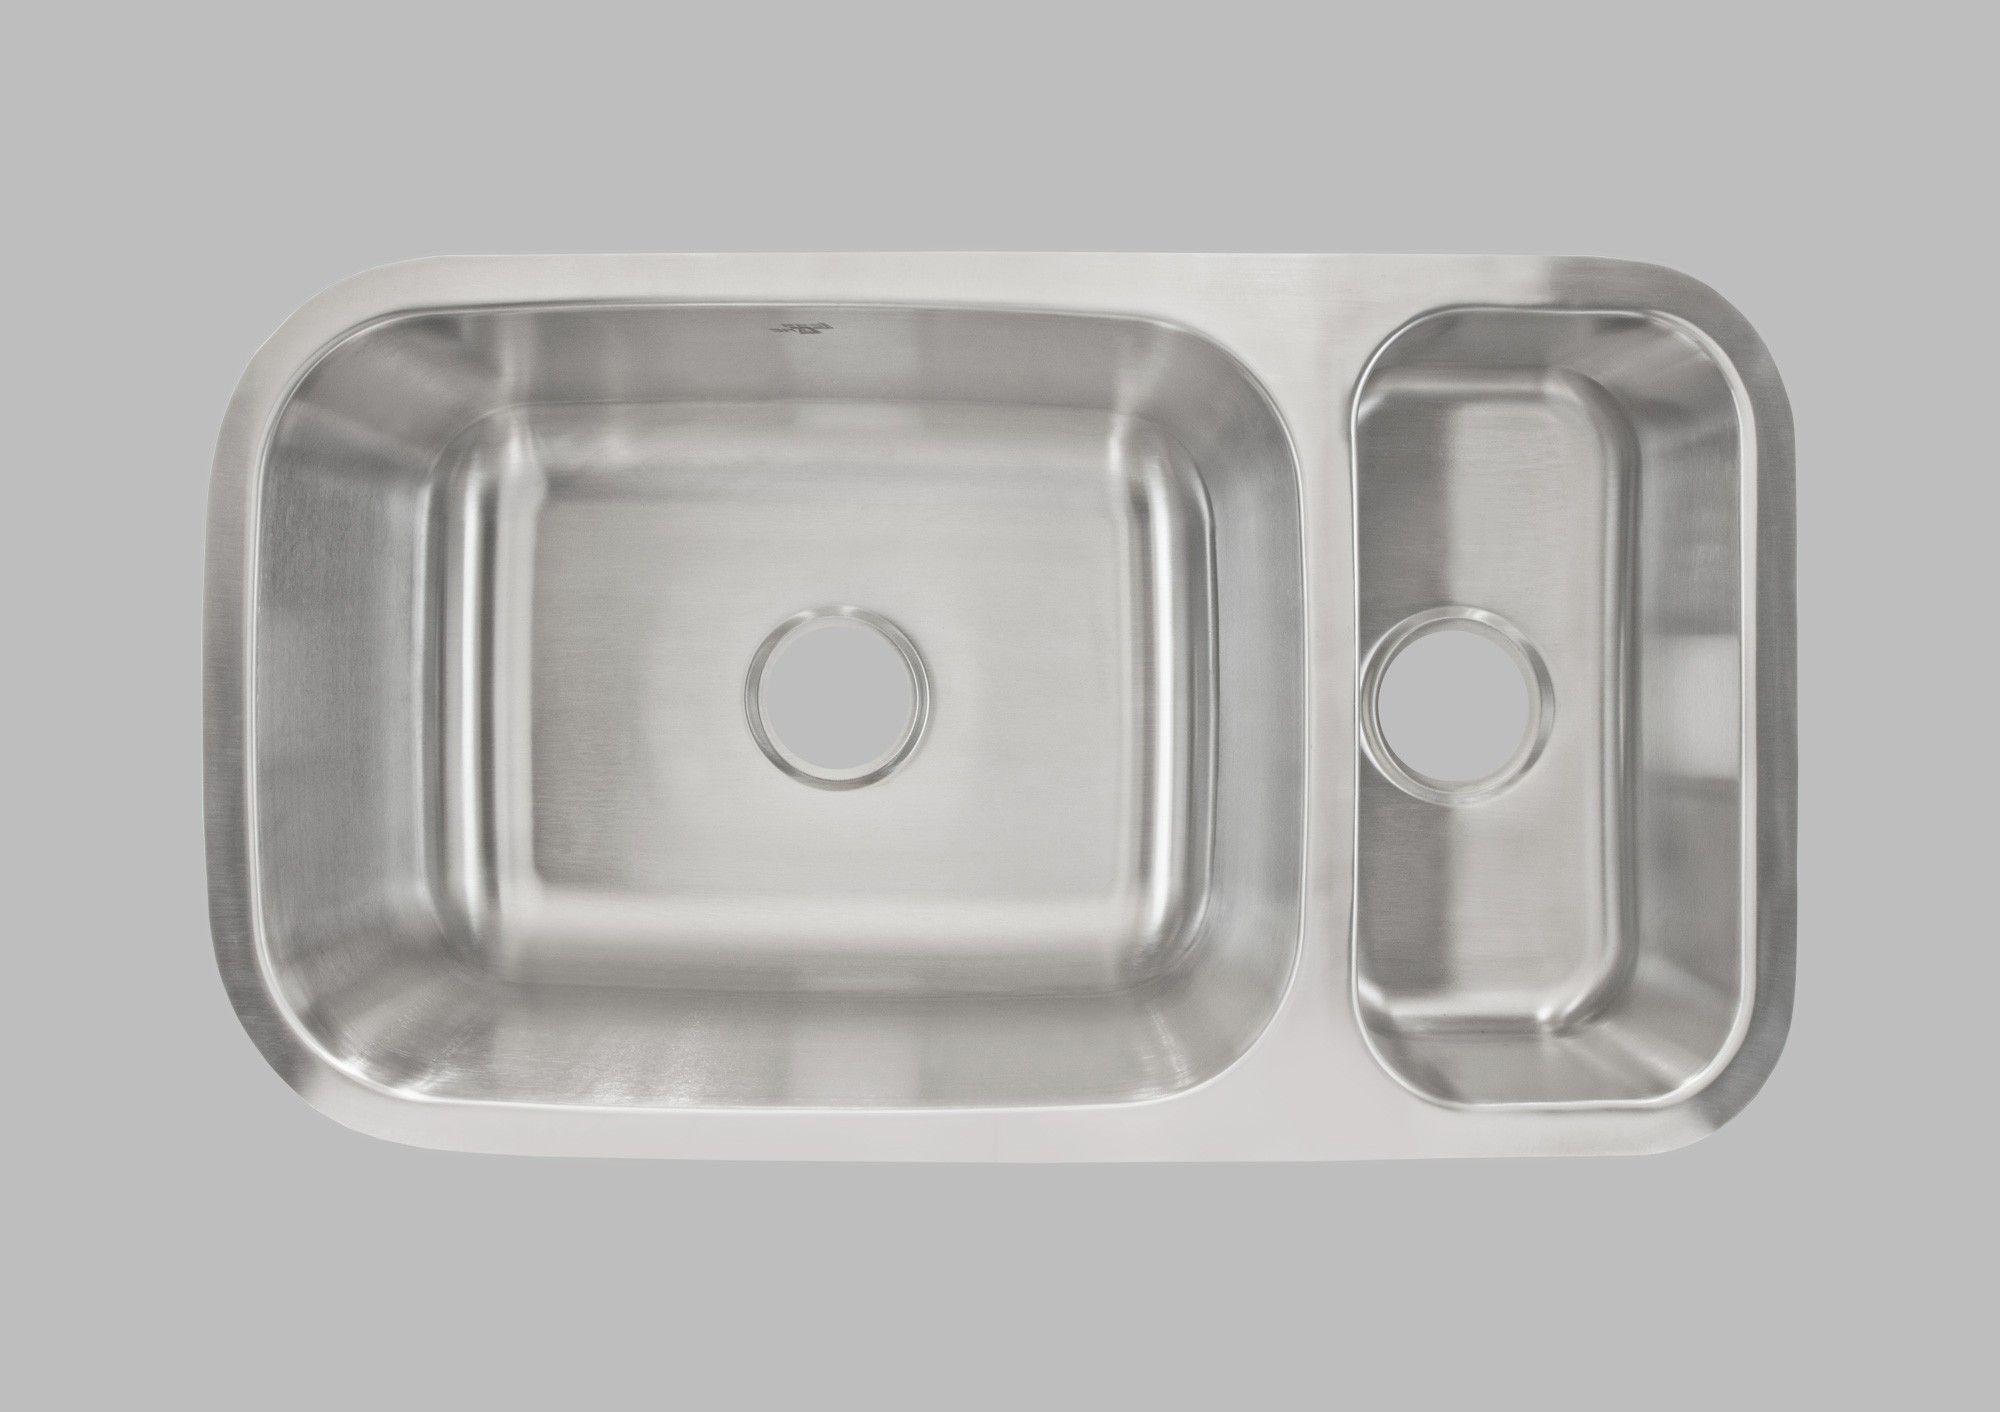 Undermount Double Bowl Sink Lcl204r 32 1 4 W X 17 7 8 L X 9 Deep